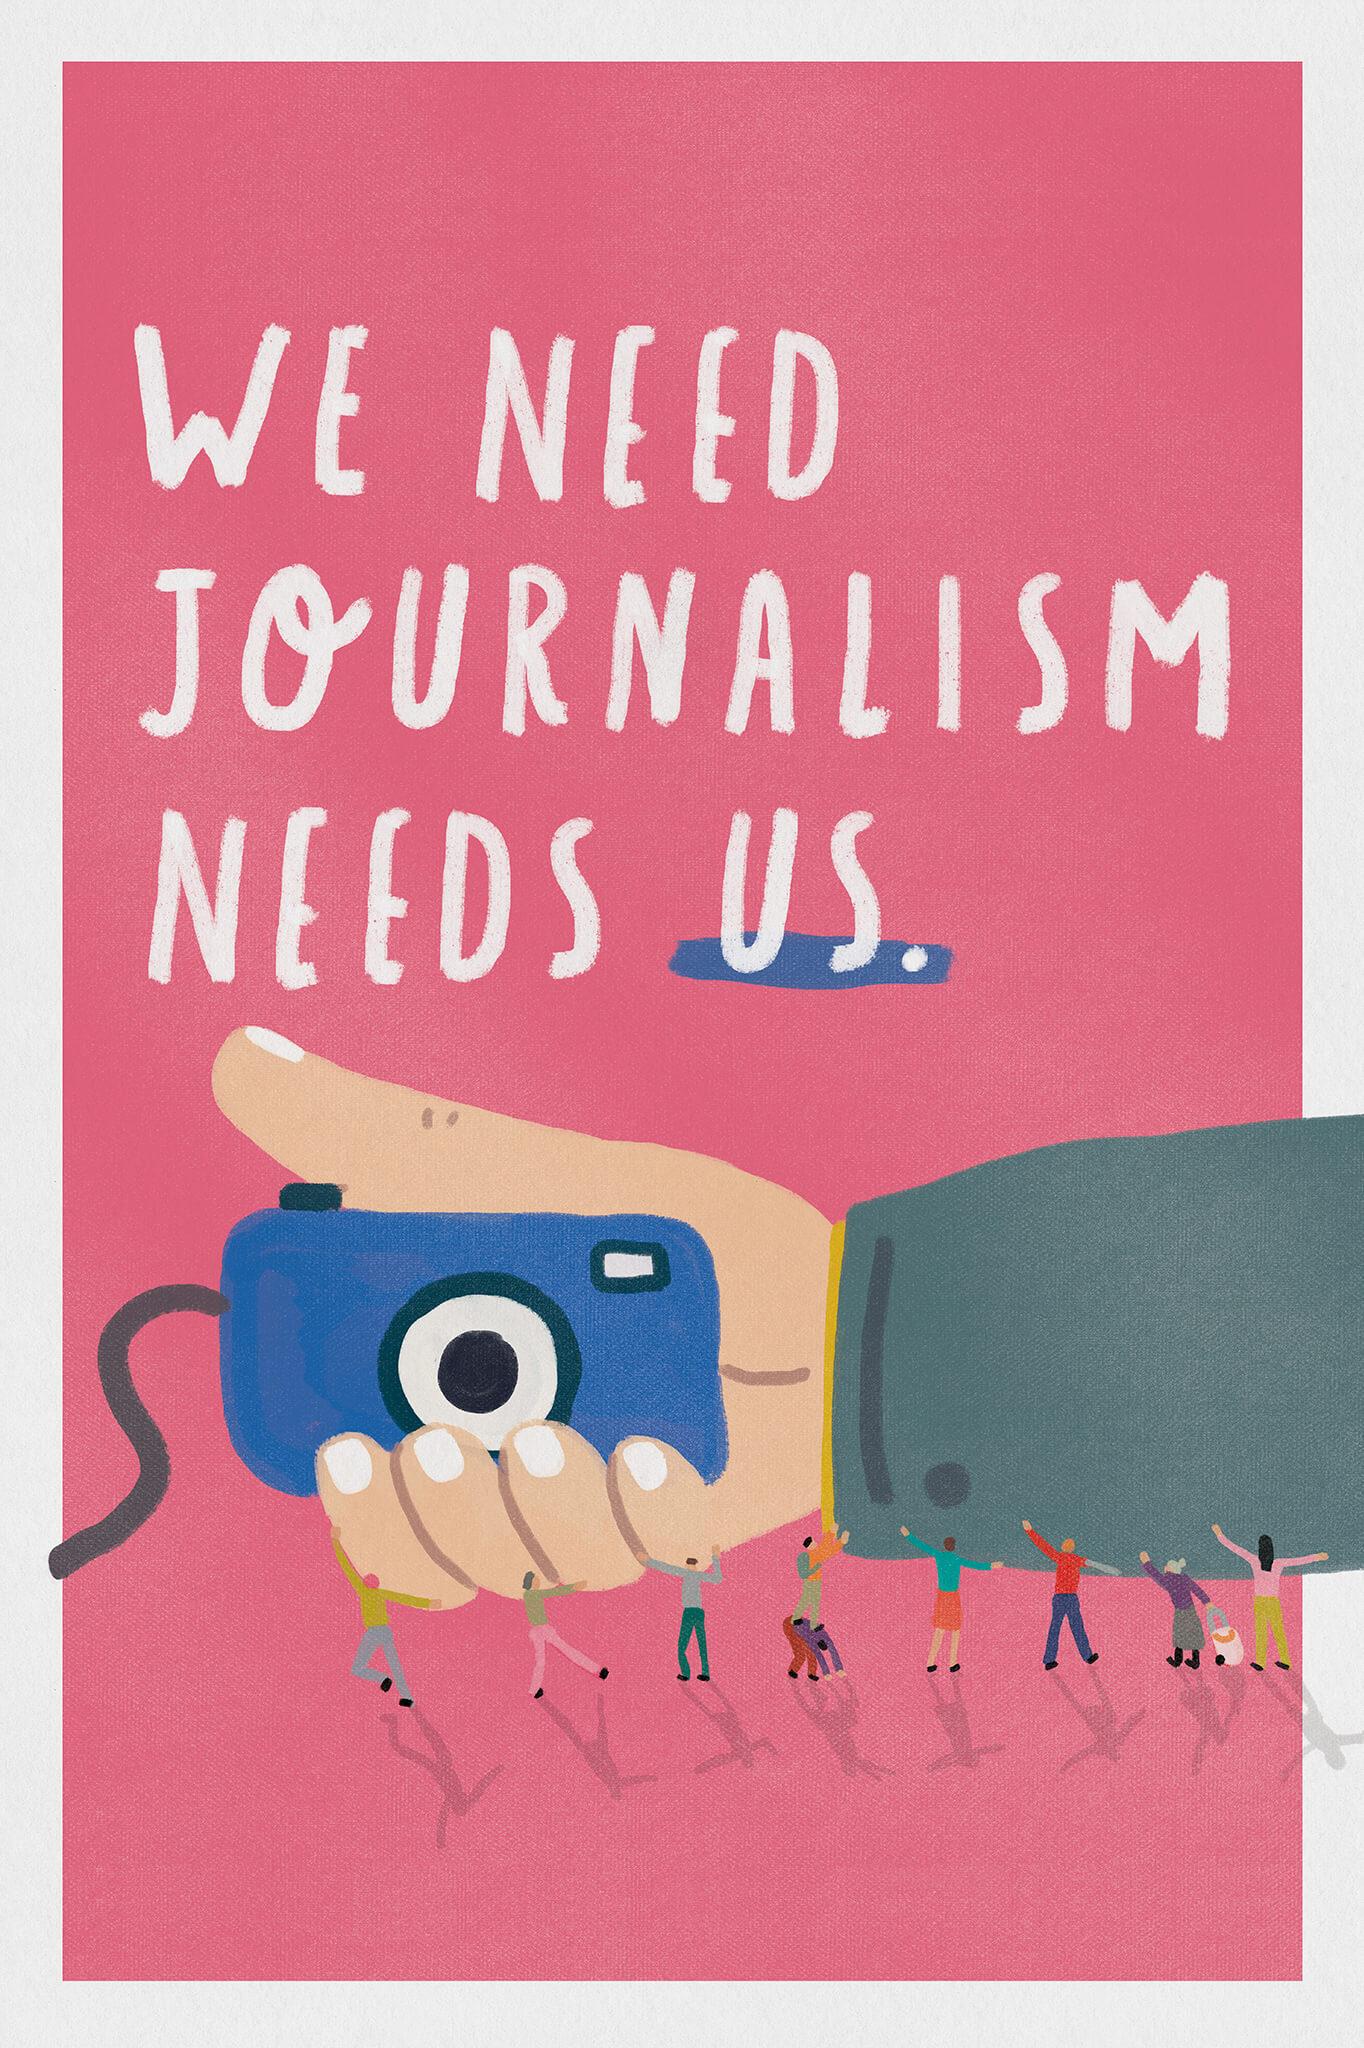 We Need Journalism (series, 3/3) main image